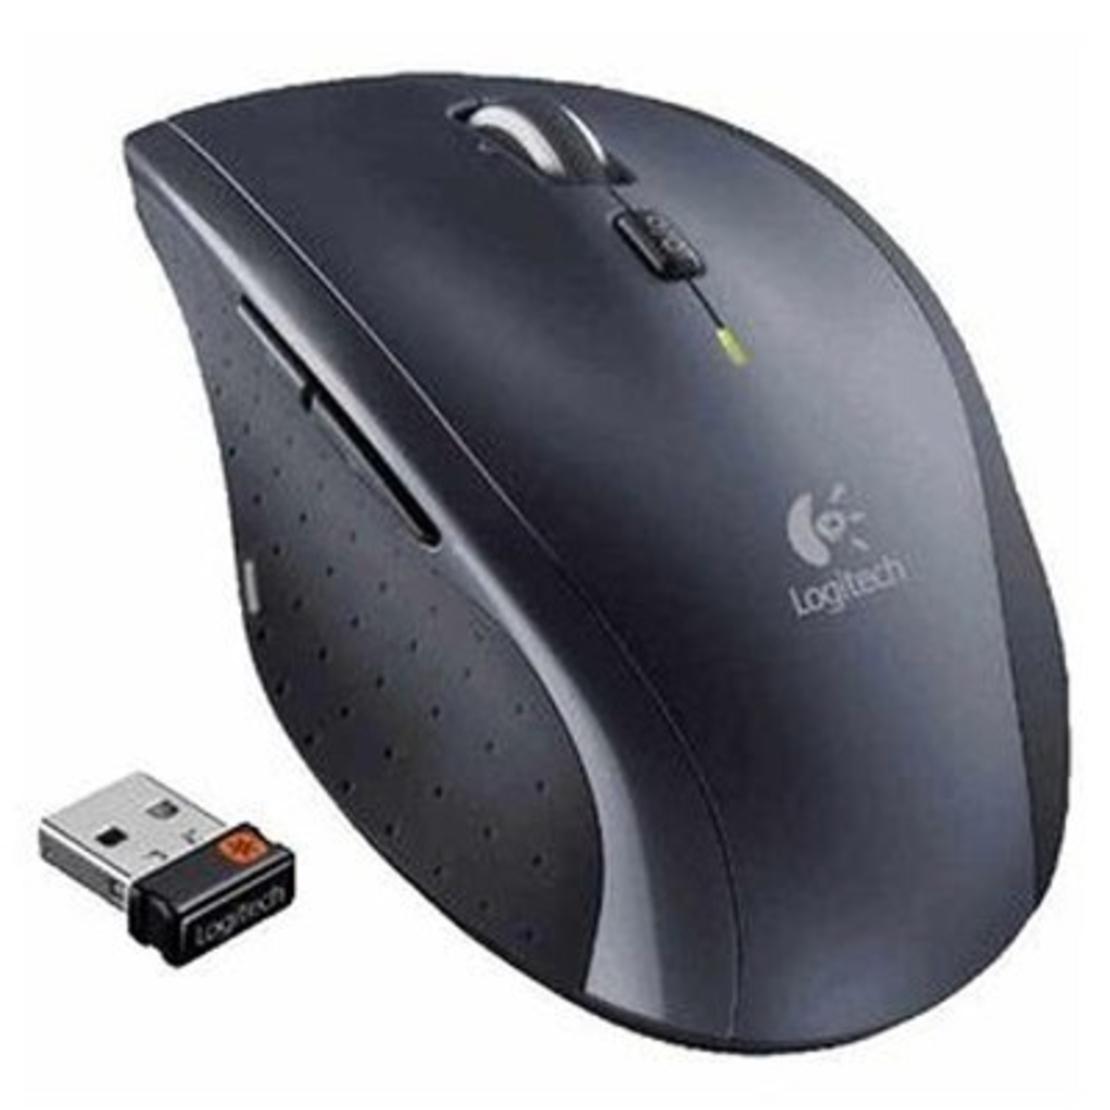 עכבר אלחוטי LogiTech Marathon Mouse M705 לוגיטק